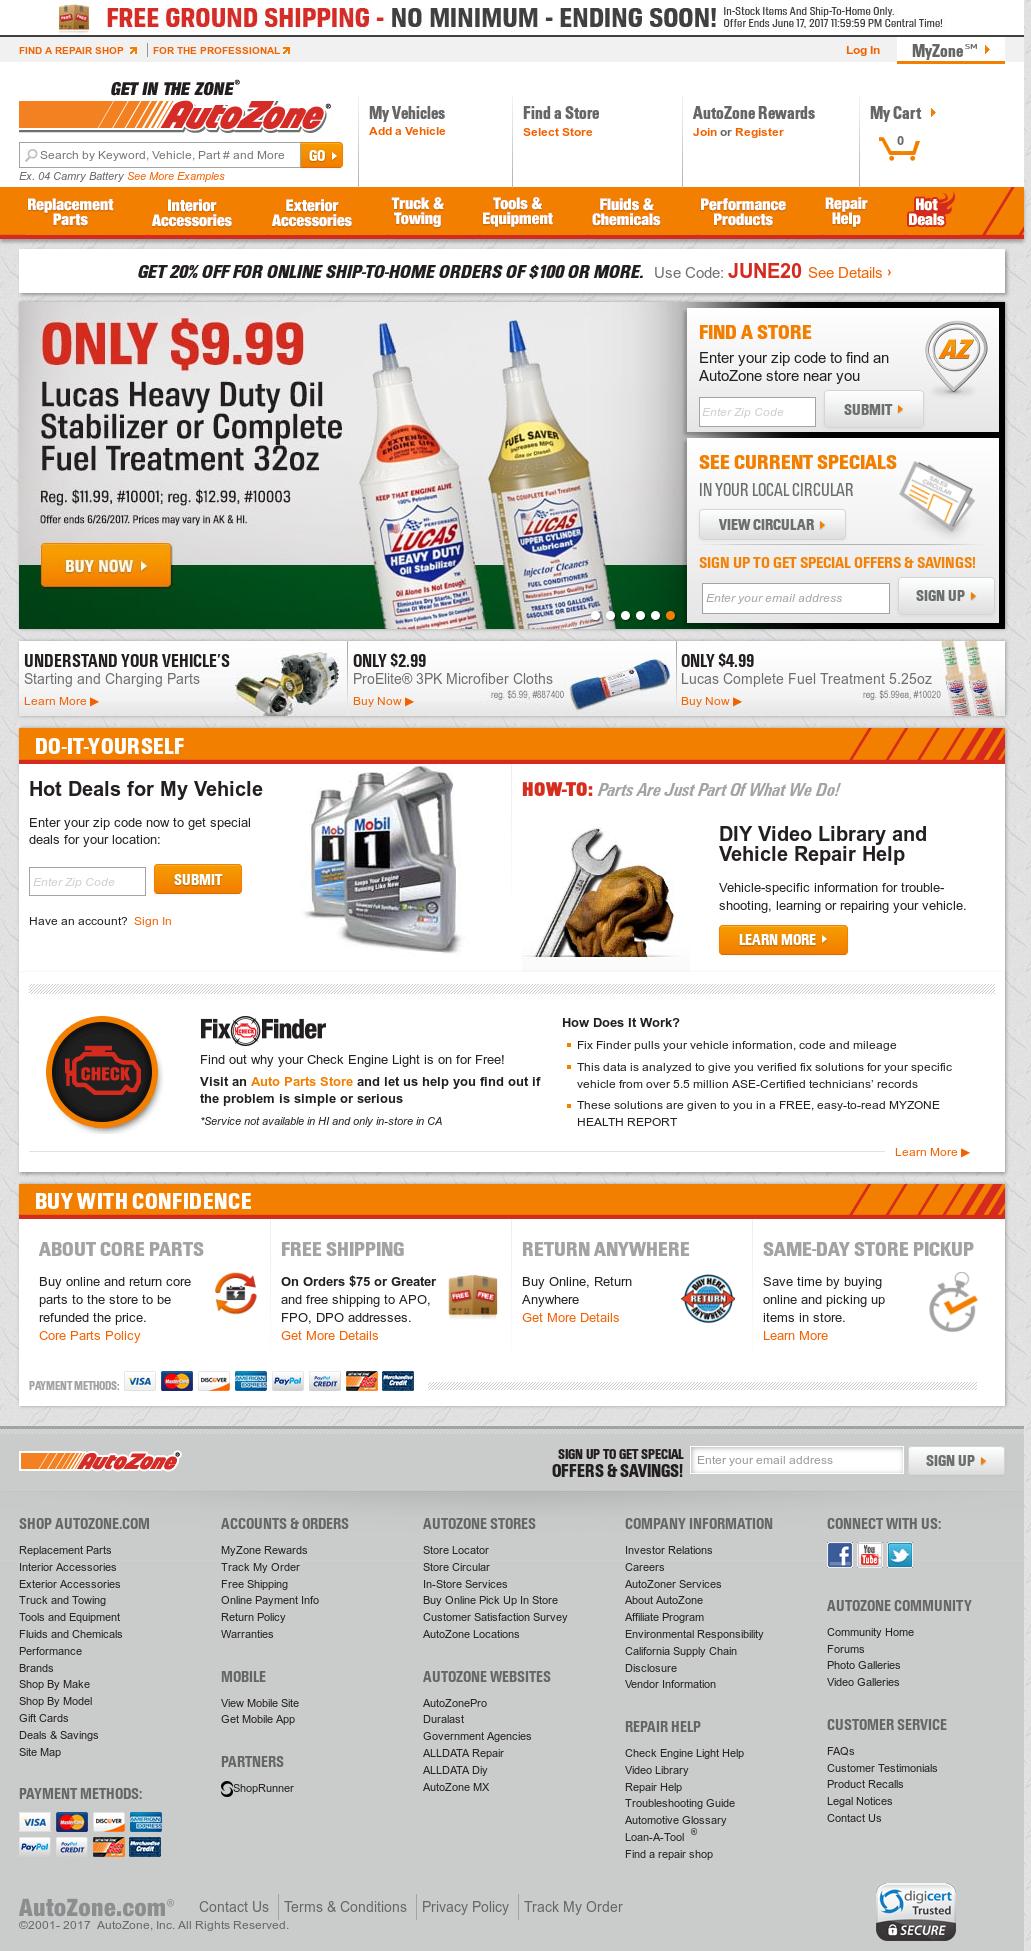 AutoZone Competitors, Revenue and Employees - Owler Company